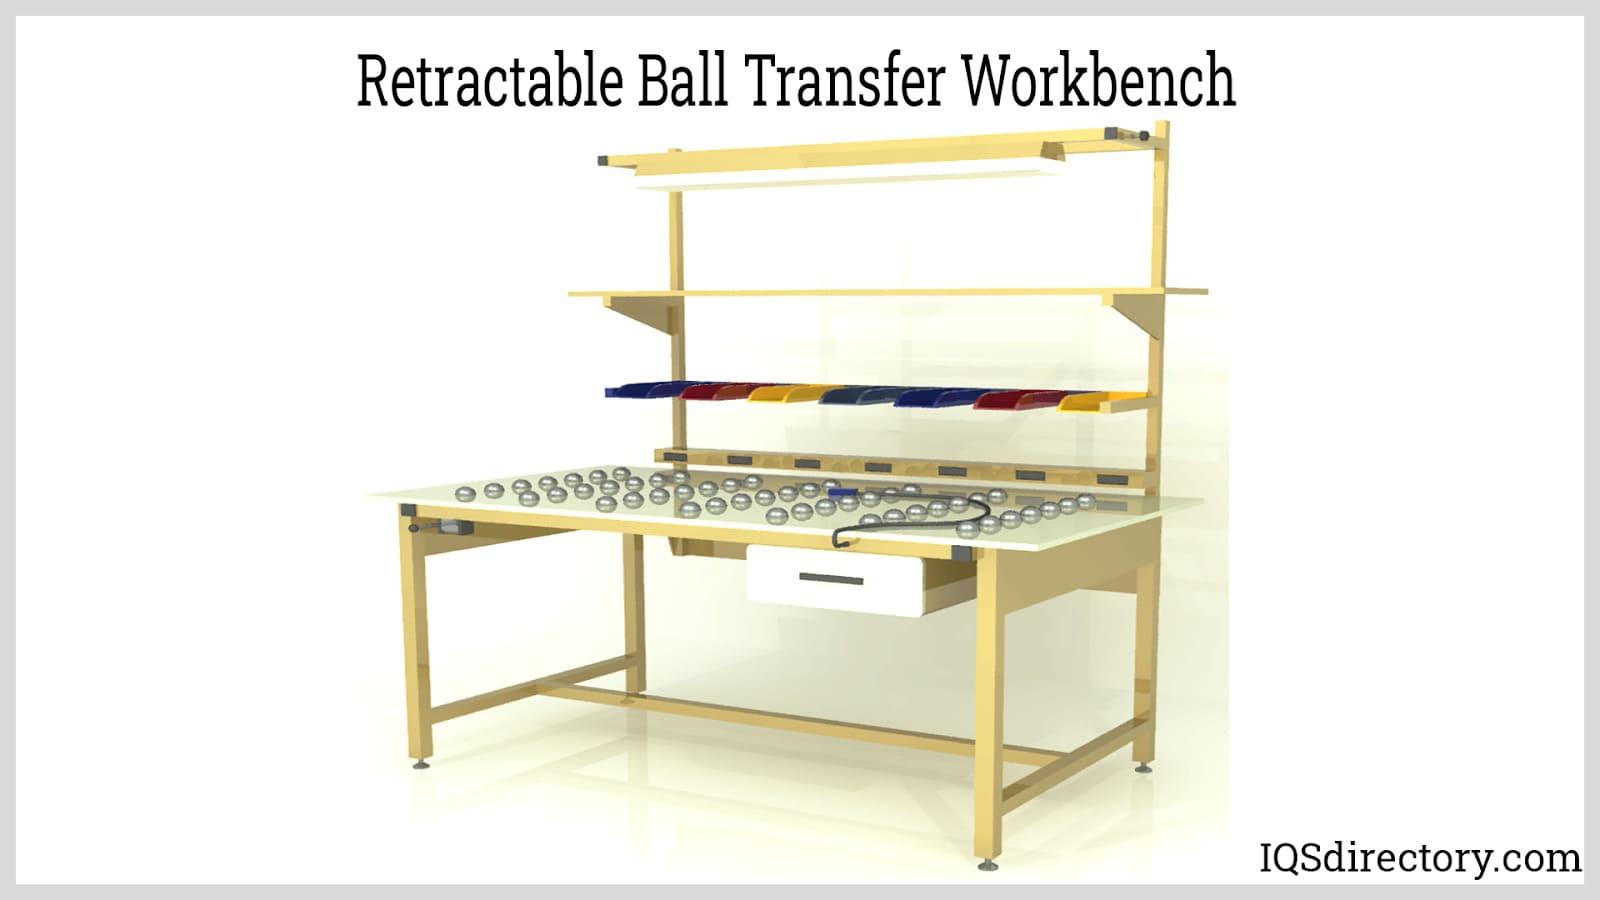 Retractable Ball Transfer Workbench